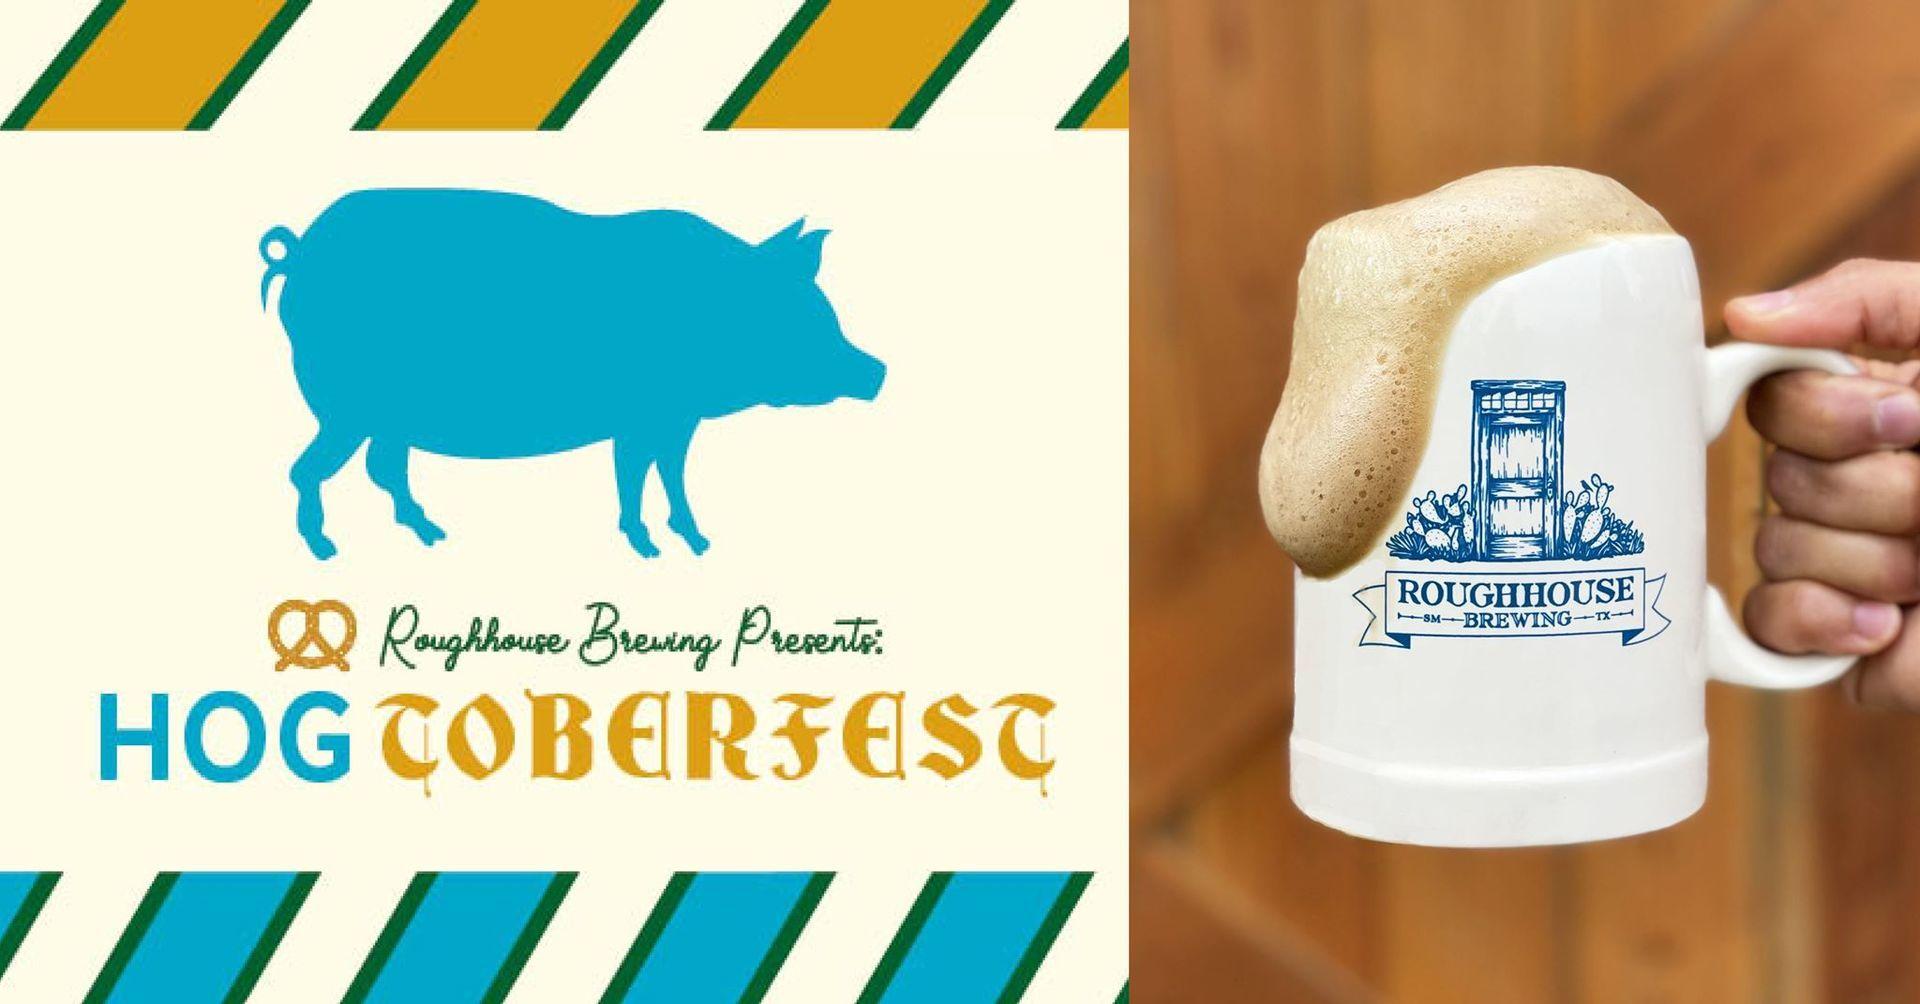 9/25 Hogtoberfest! at Roughhouse Brewing